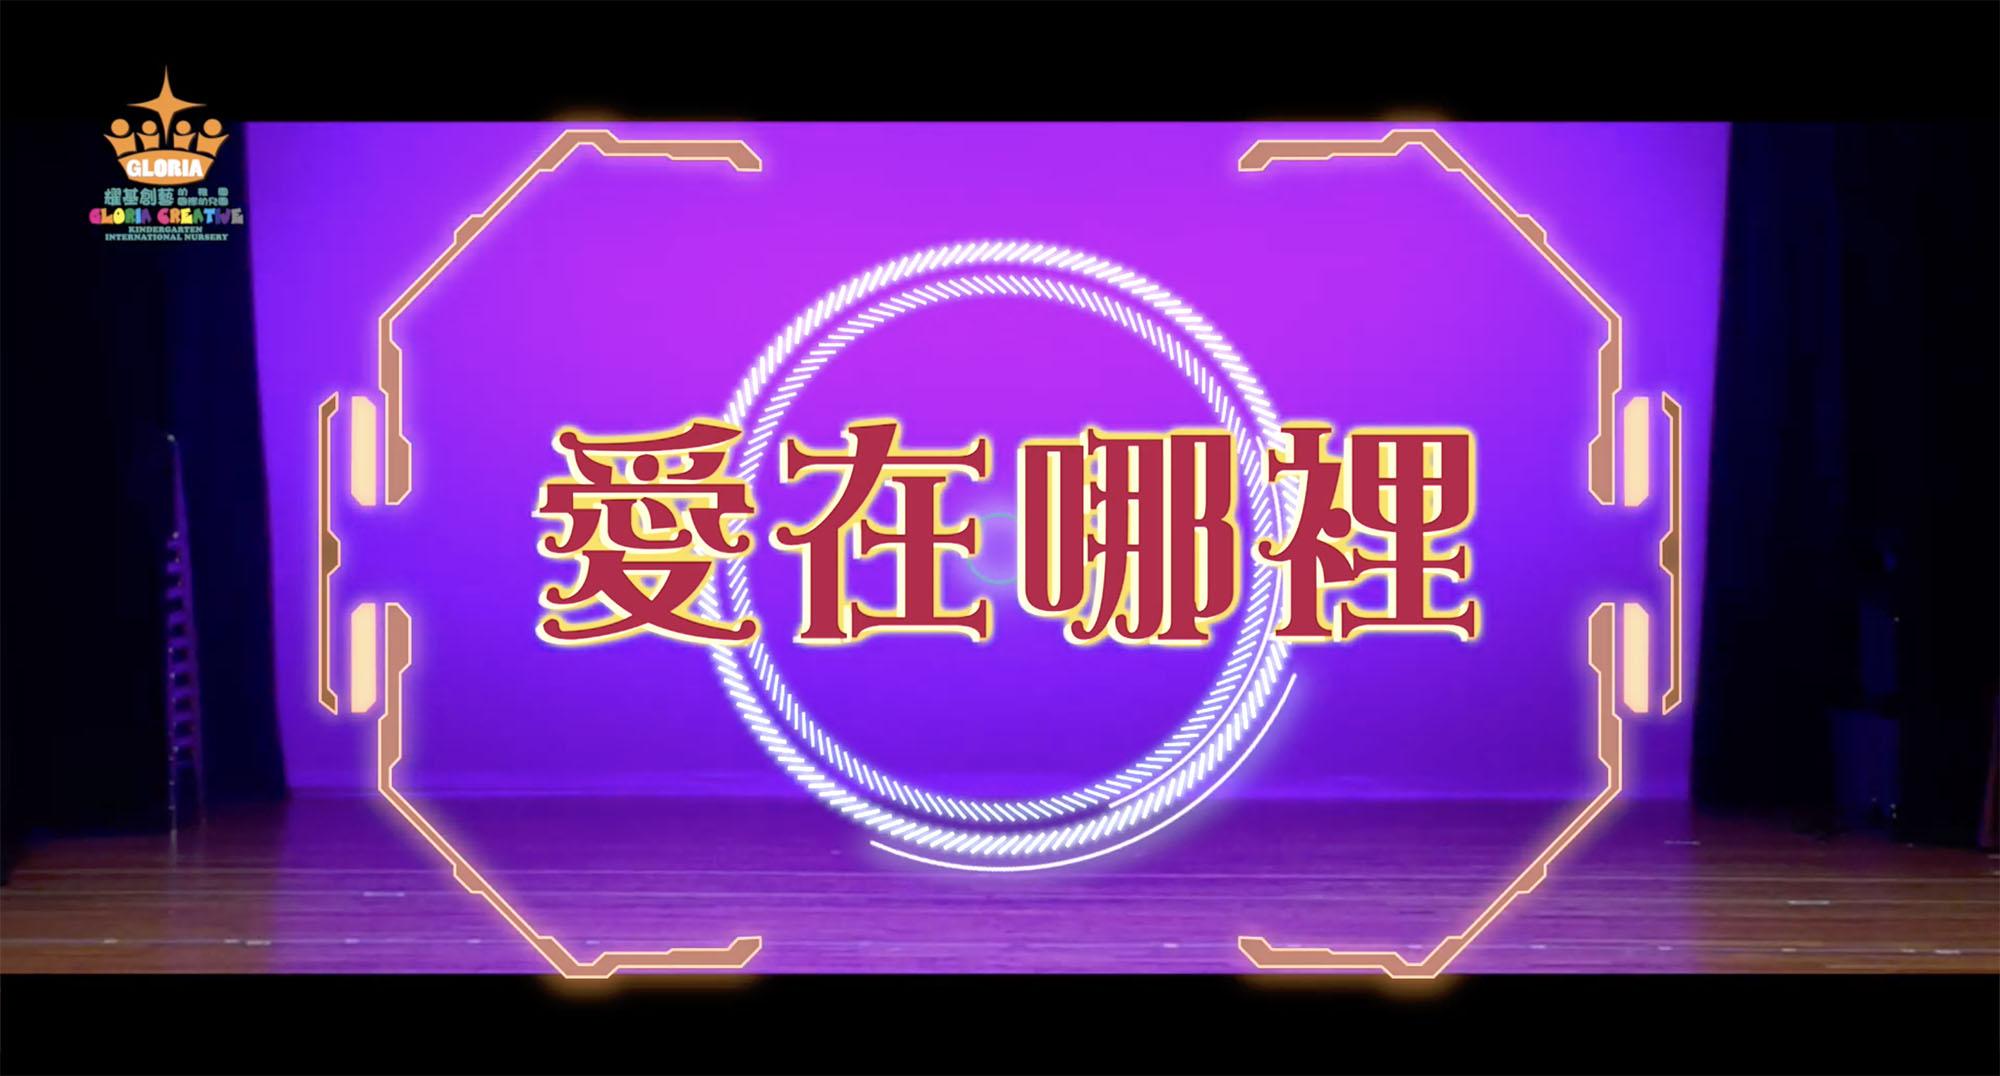 [Translate]      2019年6月20日,本園舉行第七屆聯合畢業典禮暨感恩崇拜。 這是《福音歌舞劇:愛在哪裡》片段。